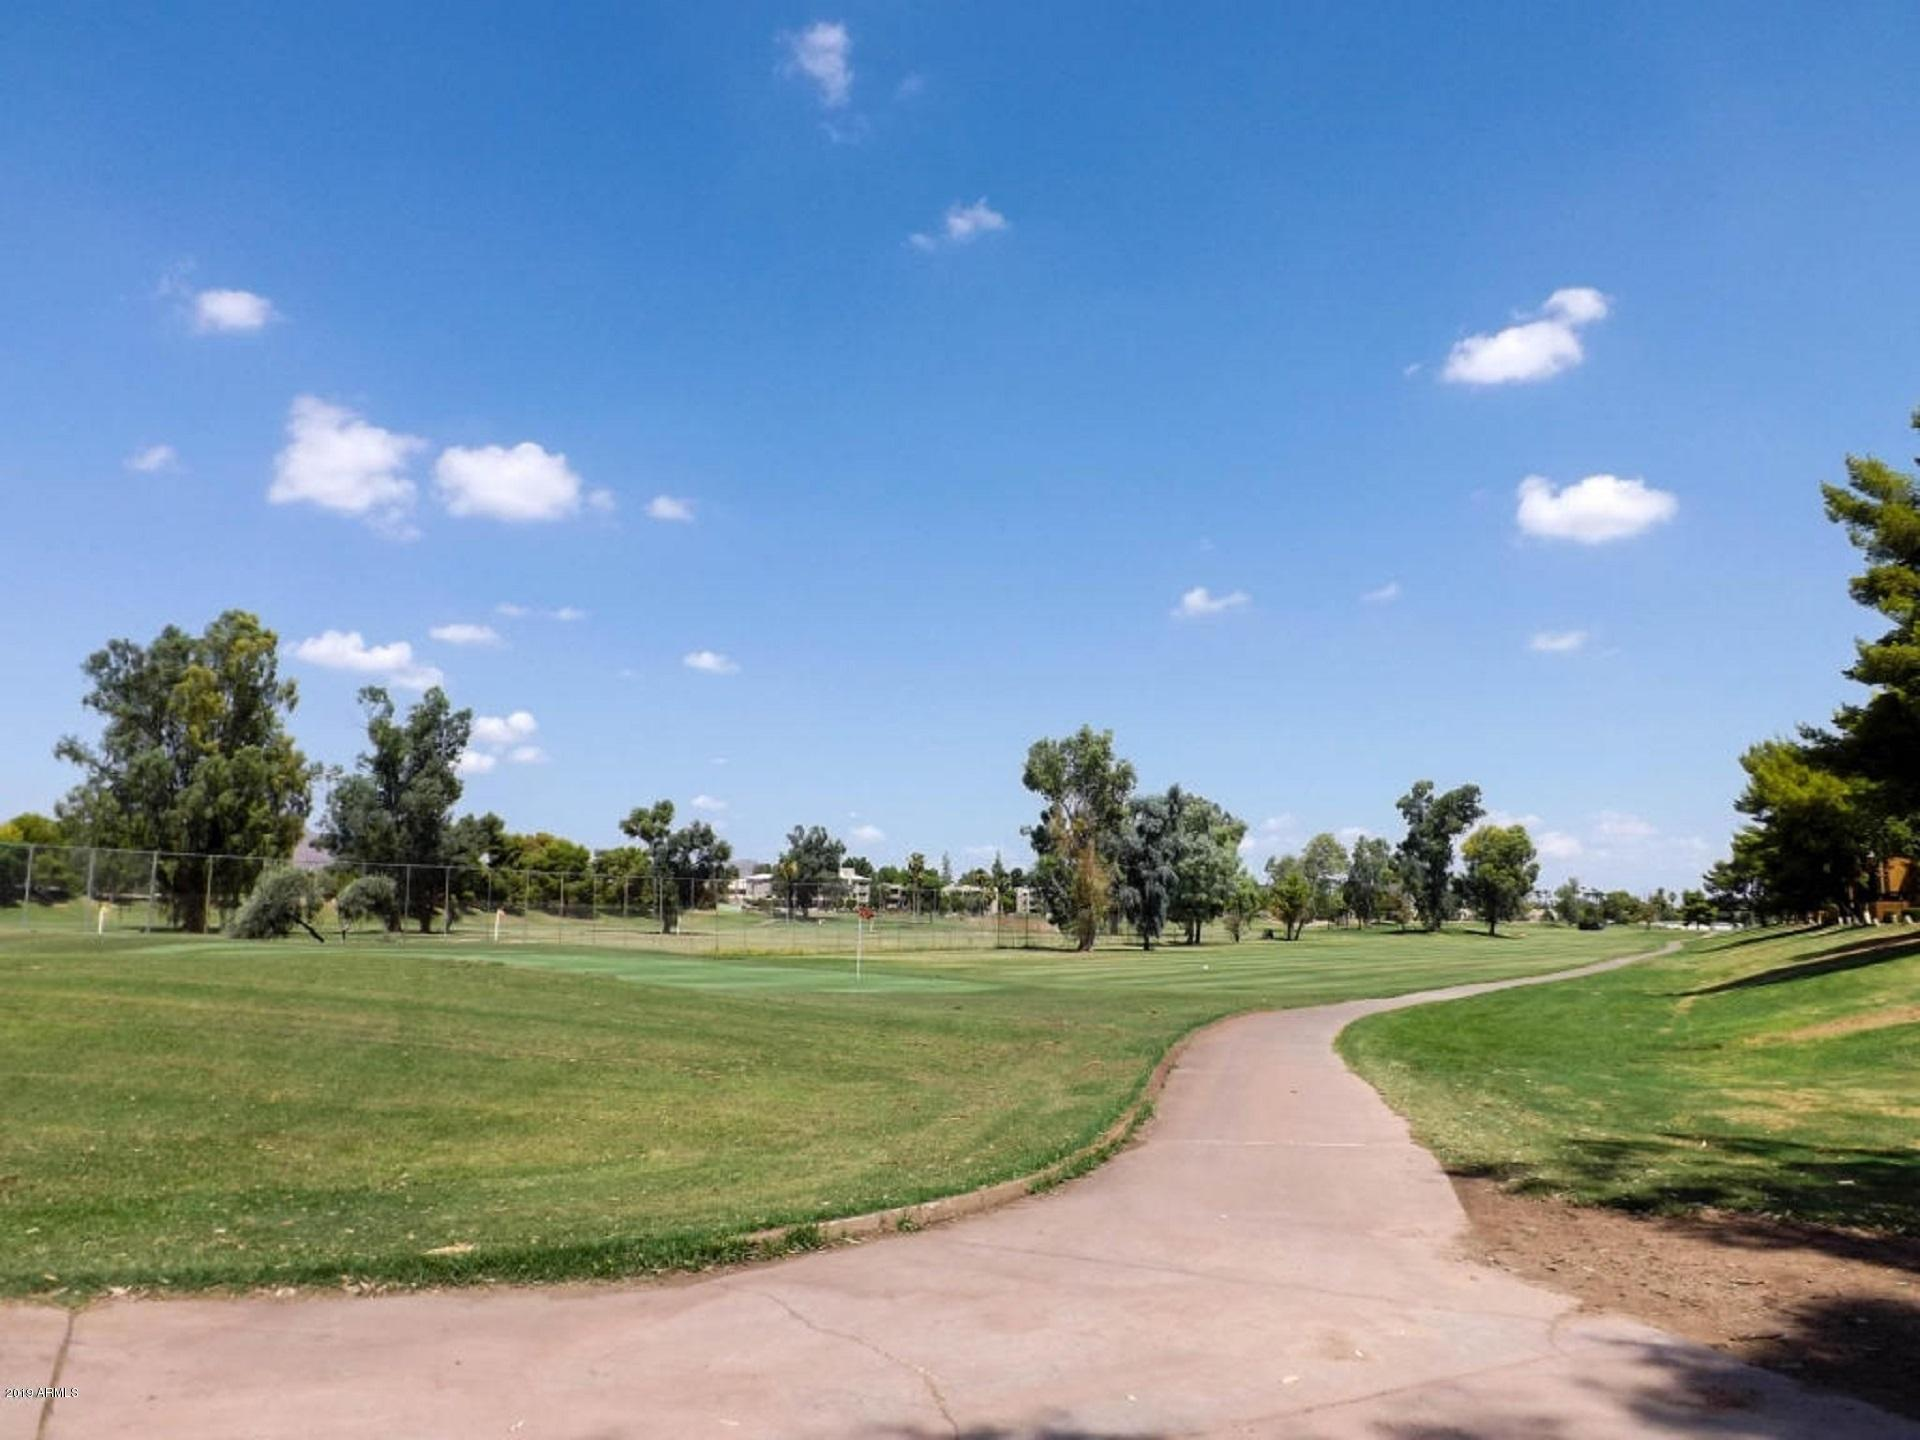 MLS 5896188 3600 N HAYDEN Road Unit 3407 Building 34, Scottsdale, AZ 85251 Scottsdale AZ Golf